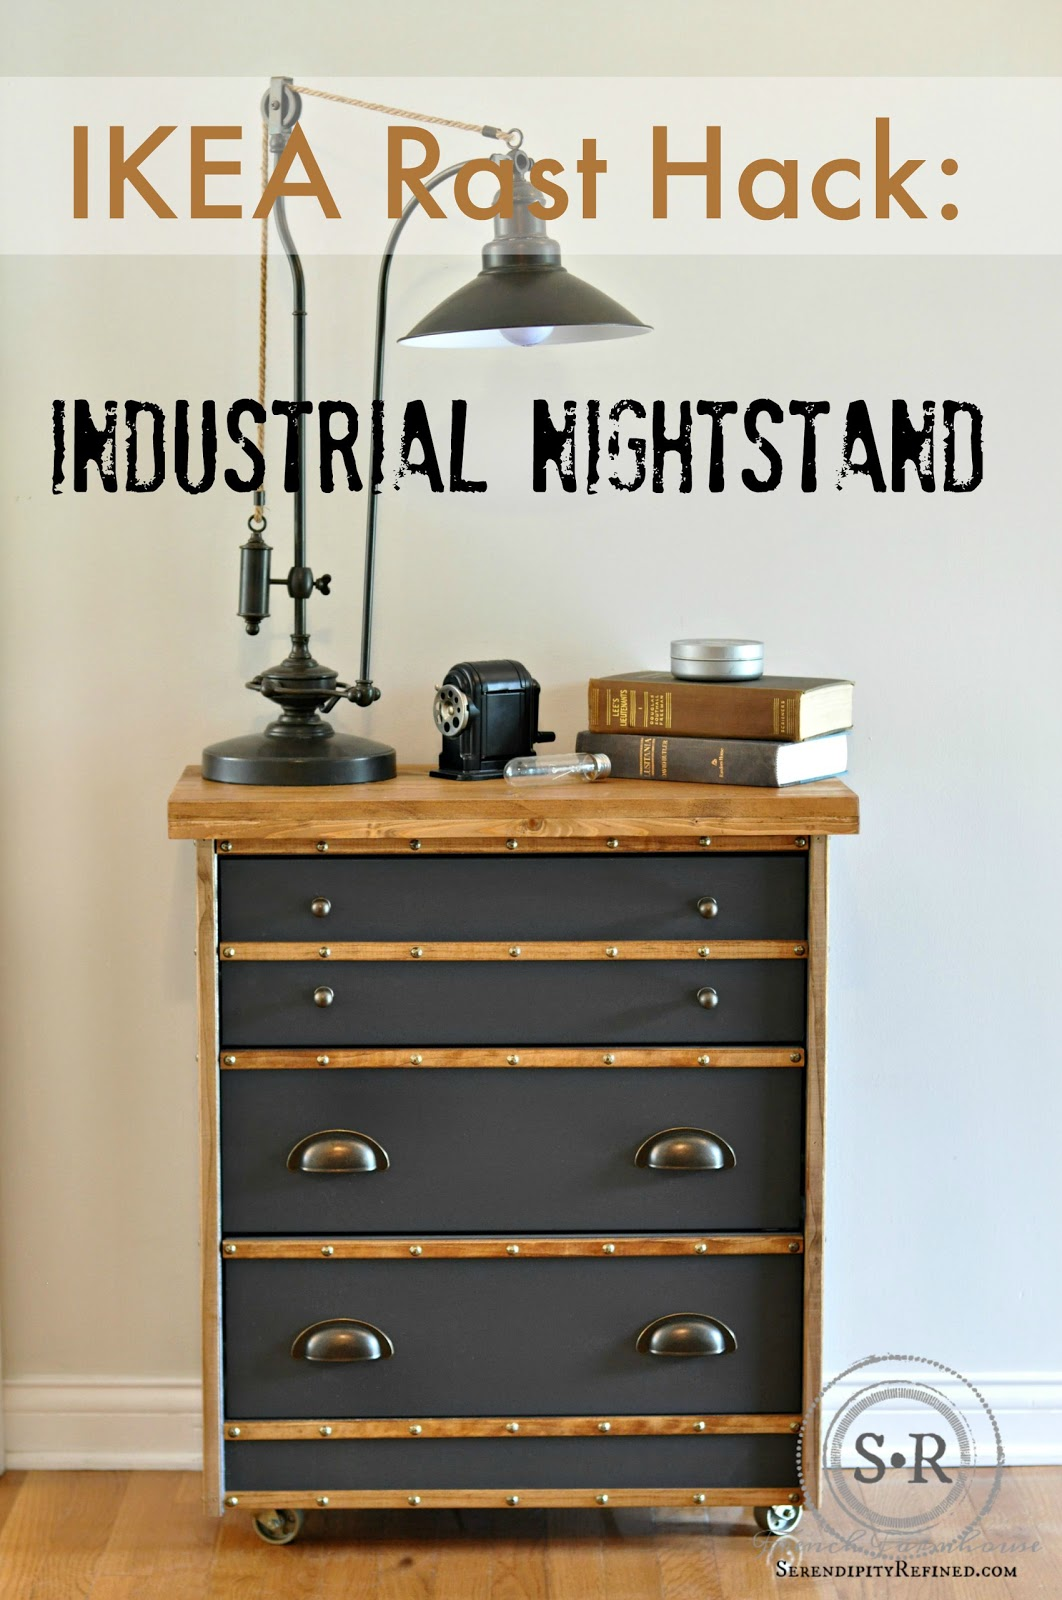 Serendipity Refined Blog IKEA Rast Hack Industrial Nightstand